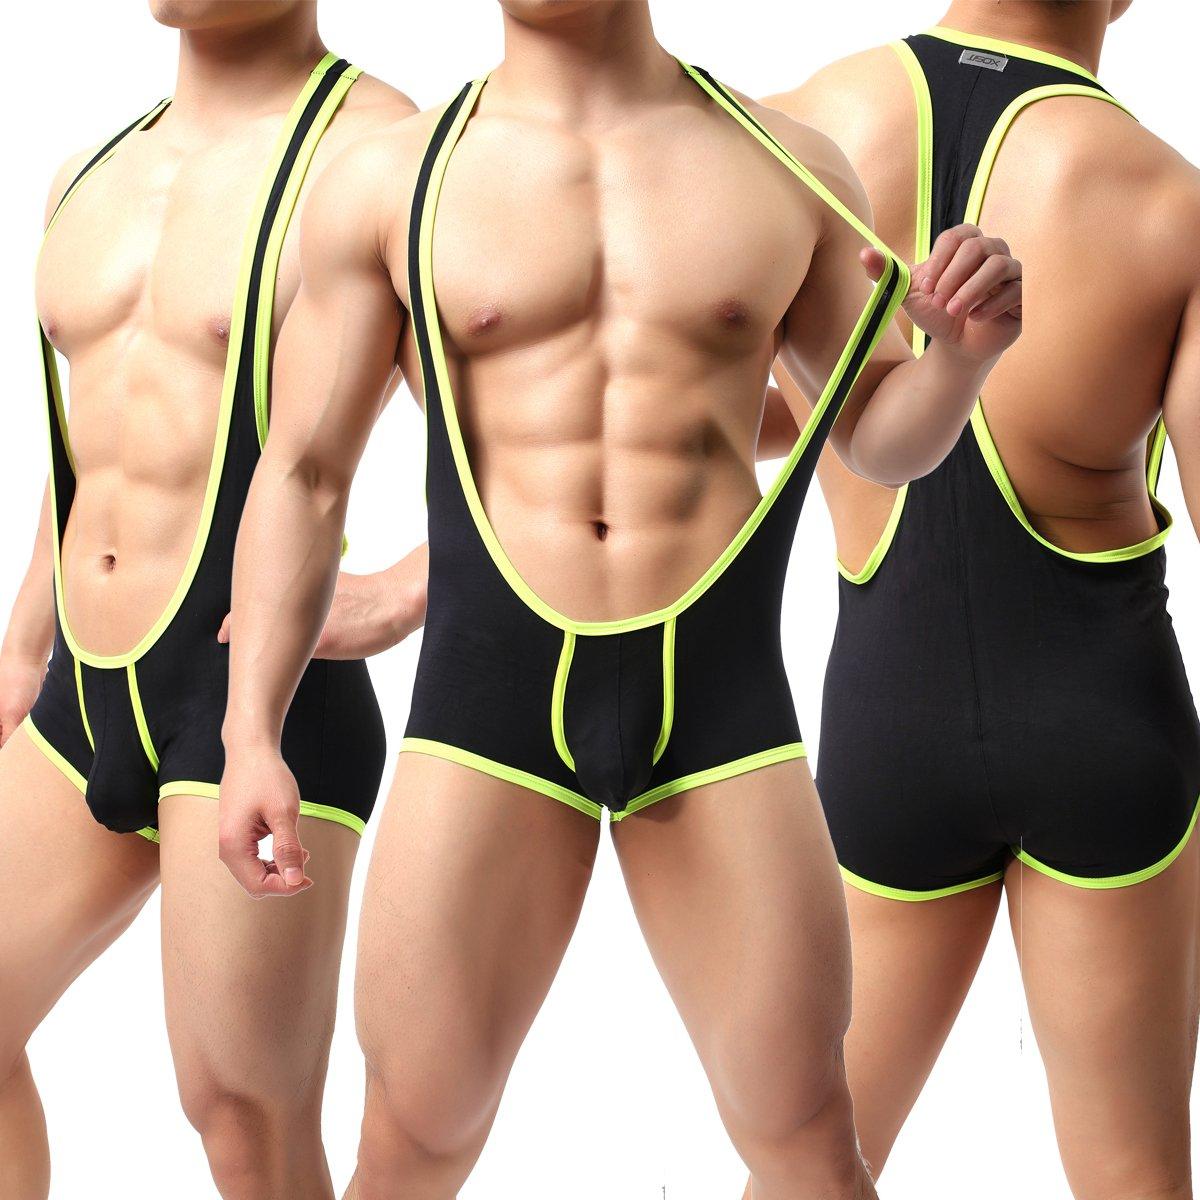 Ykeke Modal Men's Sexy Body Leotard Freestyle Wrestling Singlet Backless Bodysuit (Black, M)